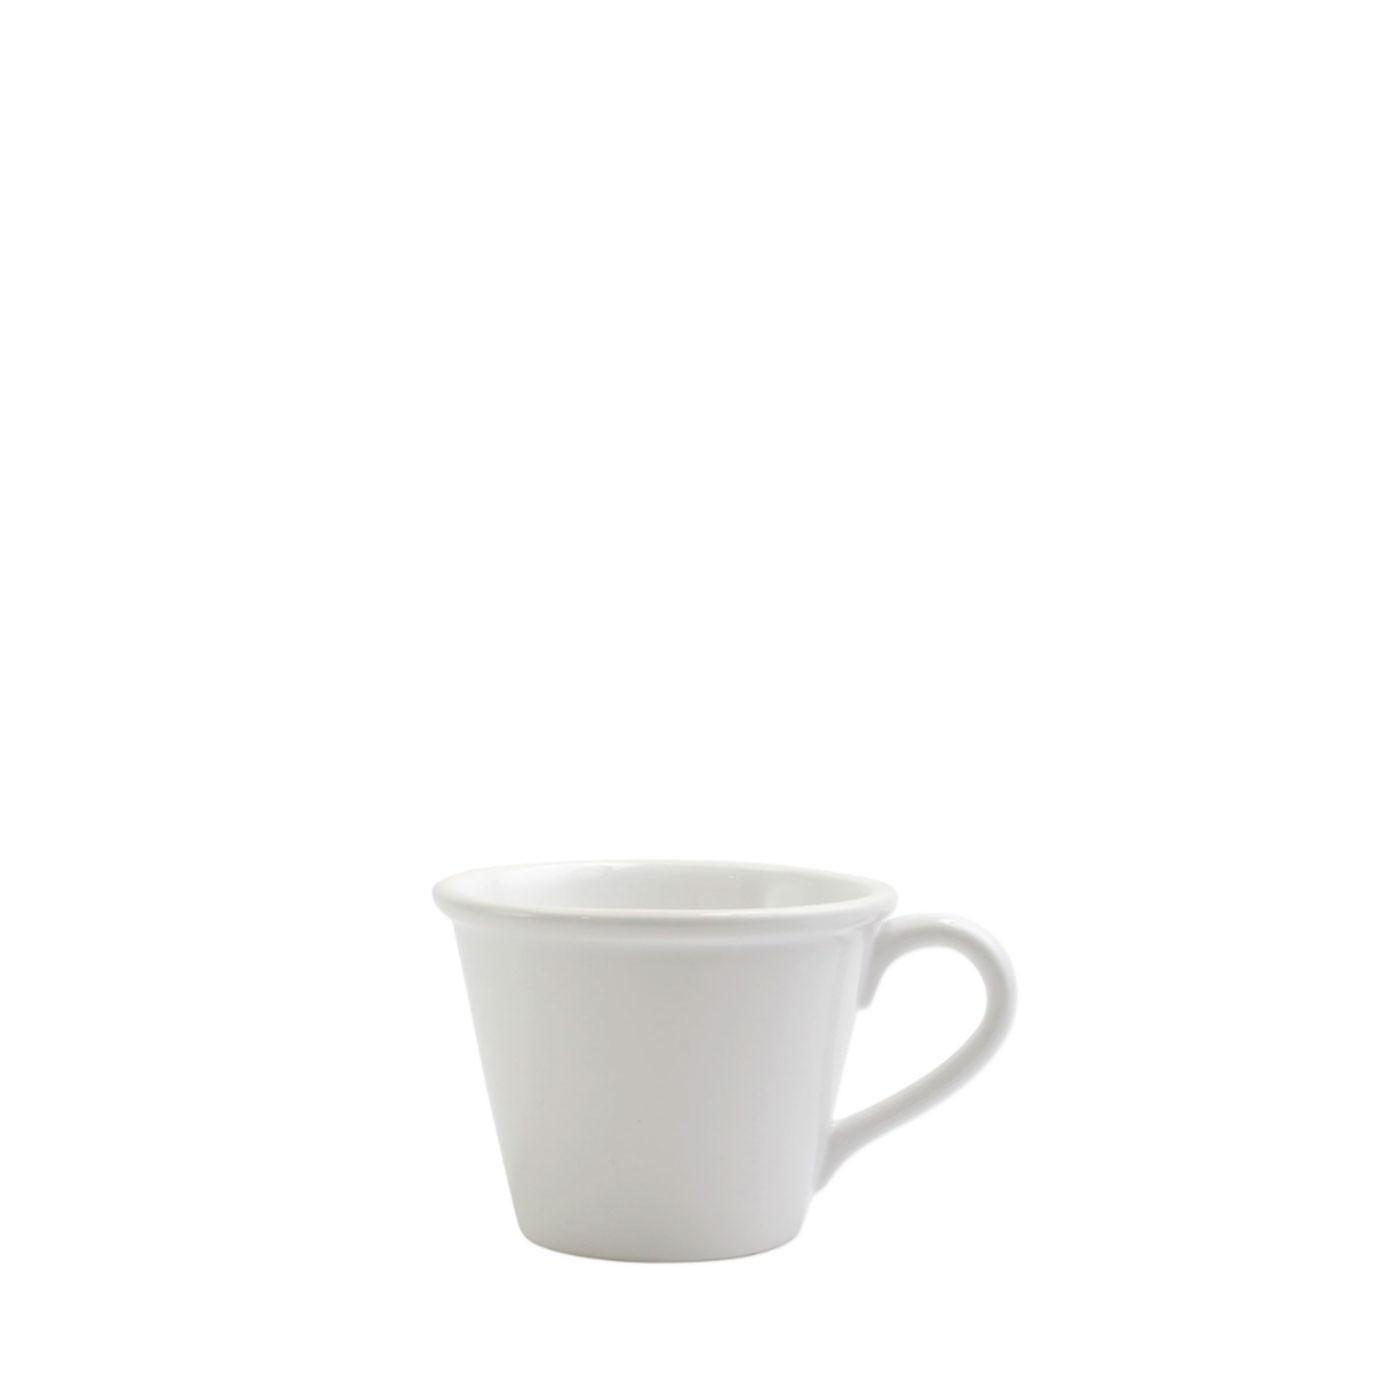 Chroma White Mug